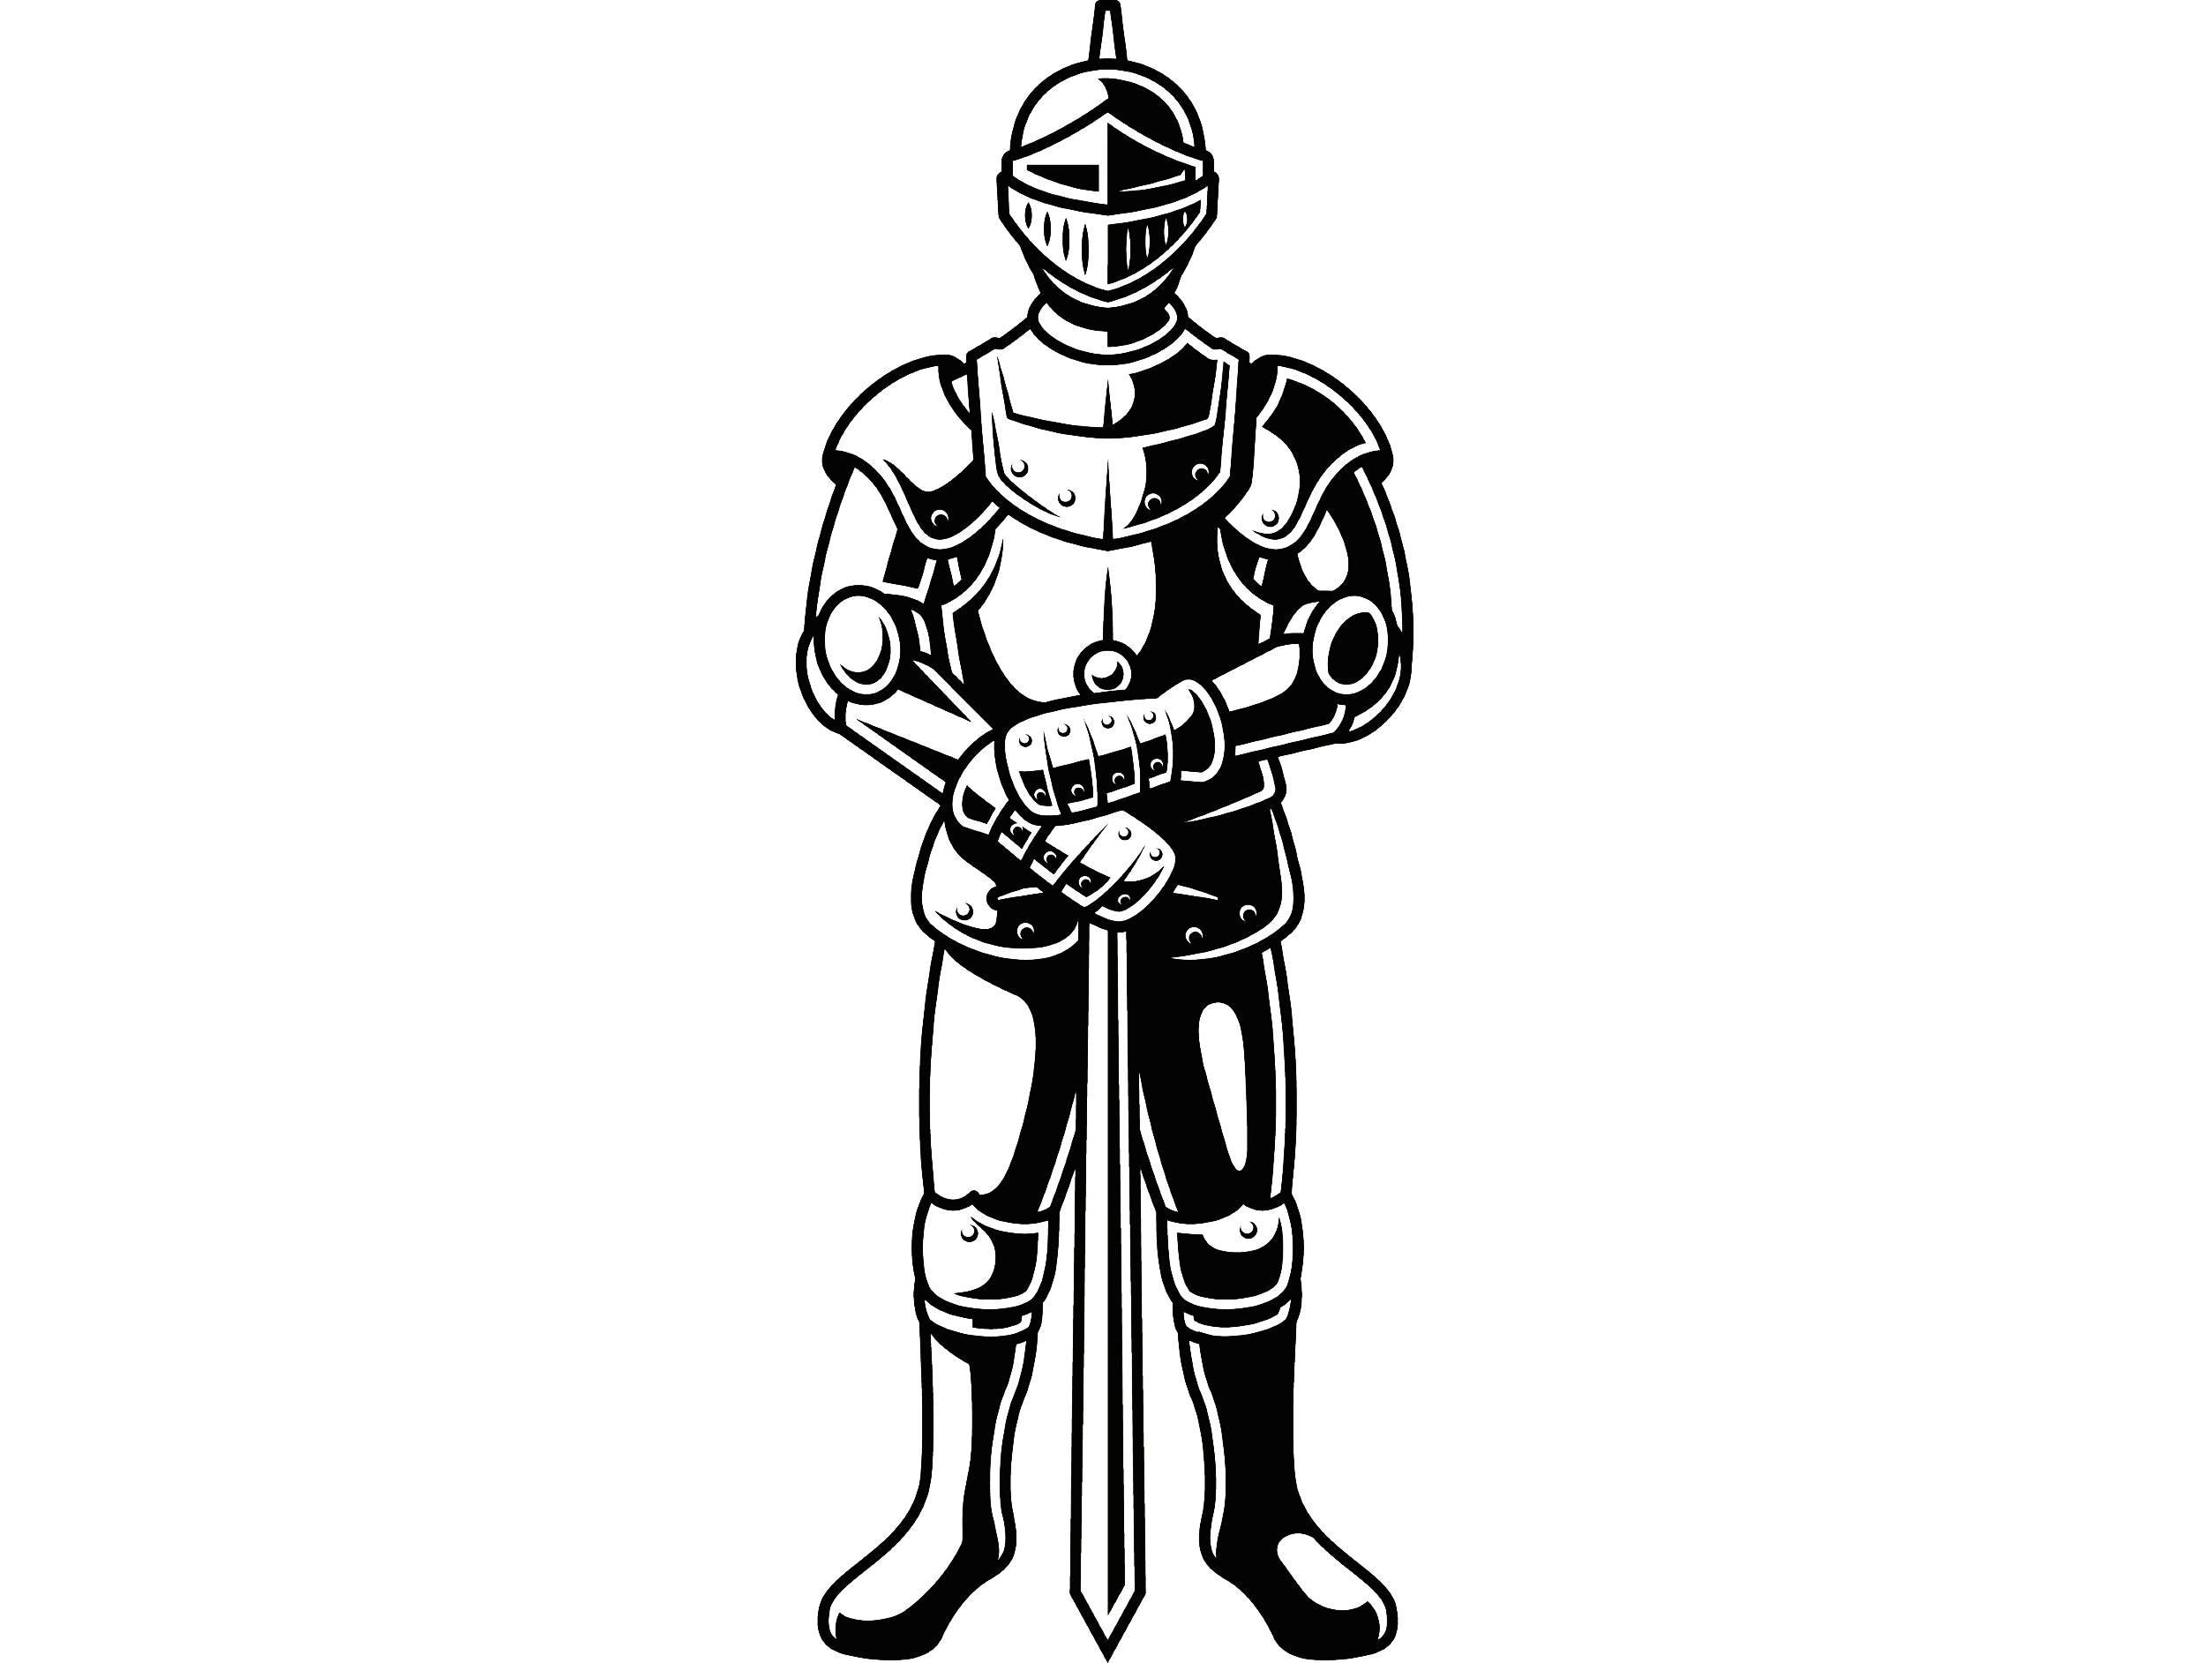 Knight 3 Metal Armor Helmet Sword Shield Monarch Military